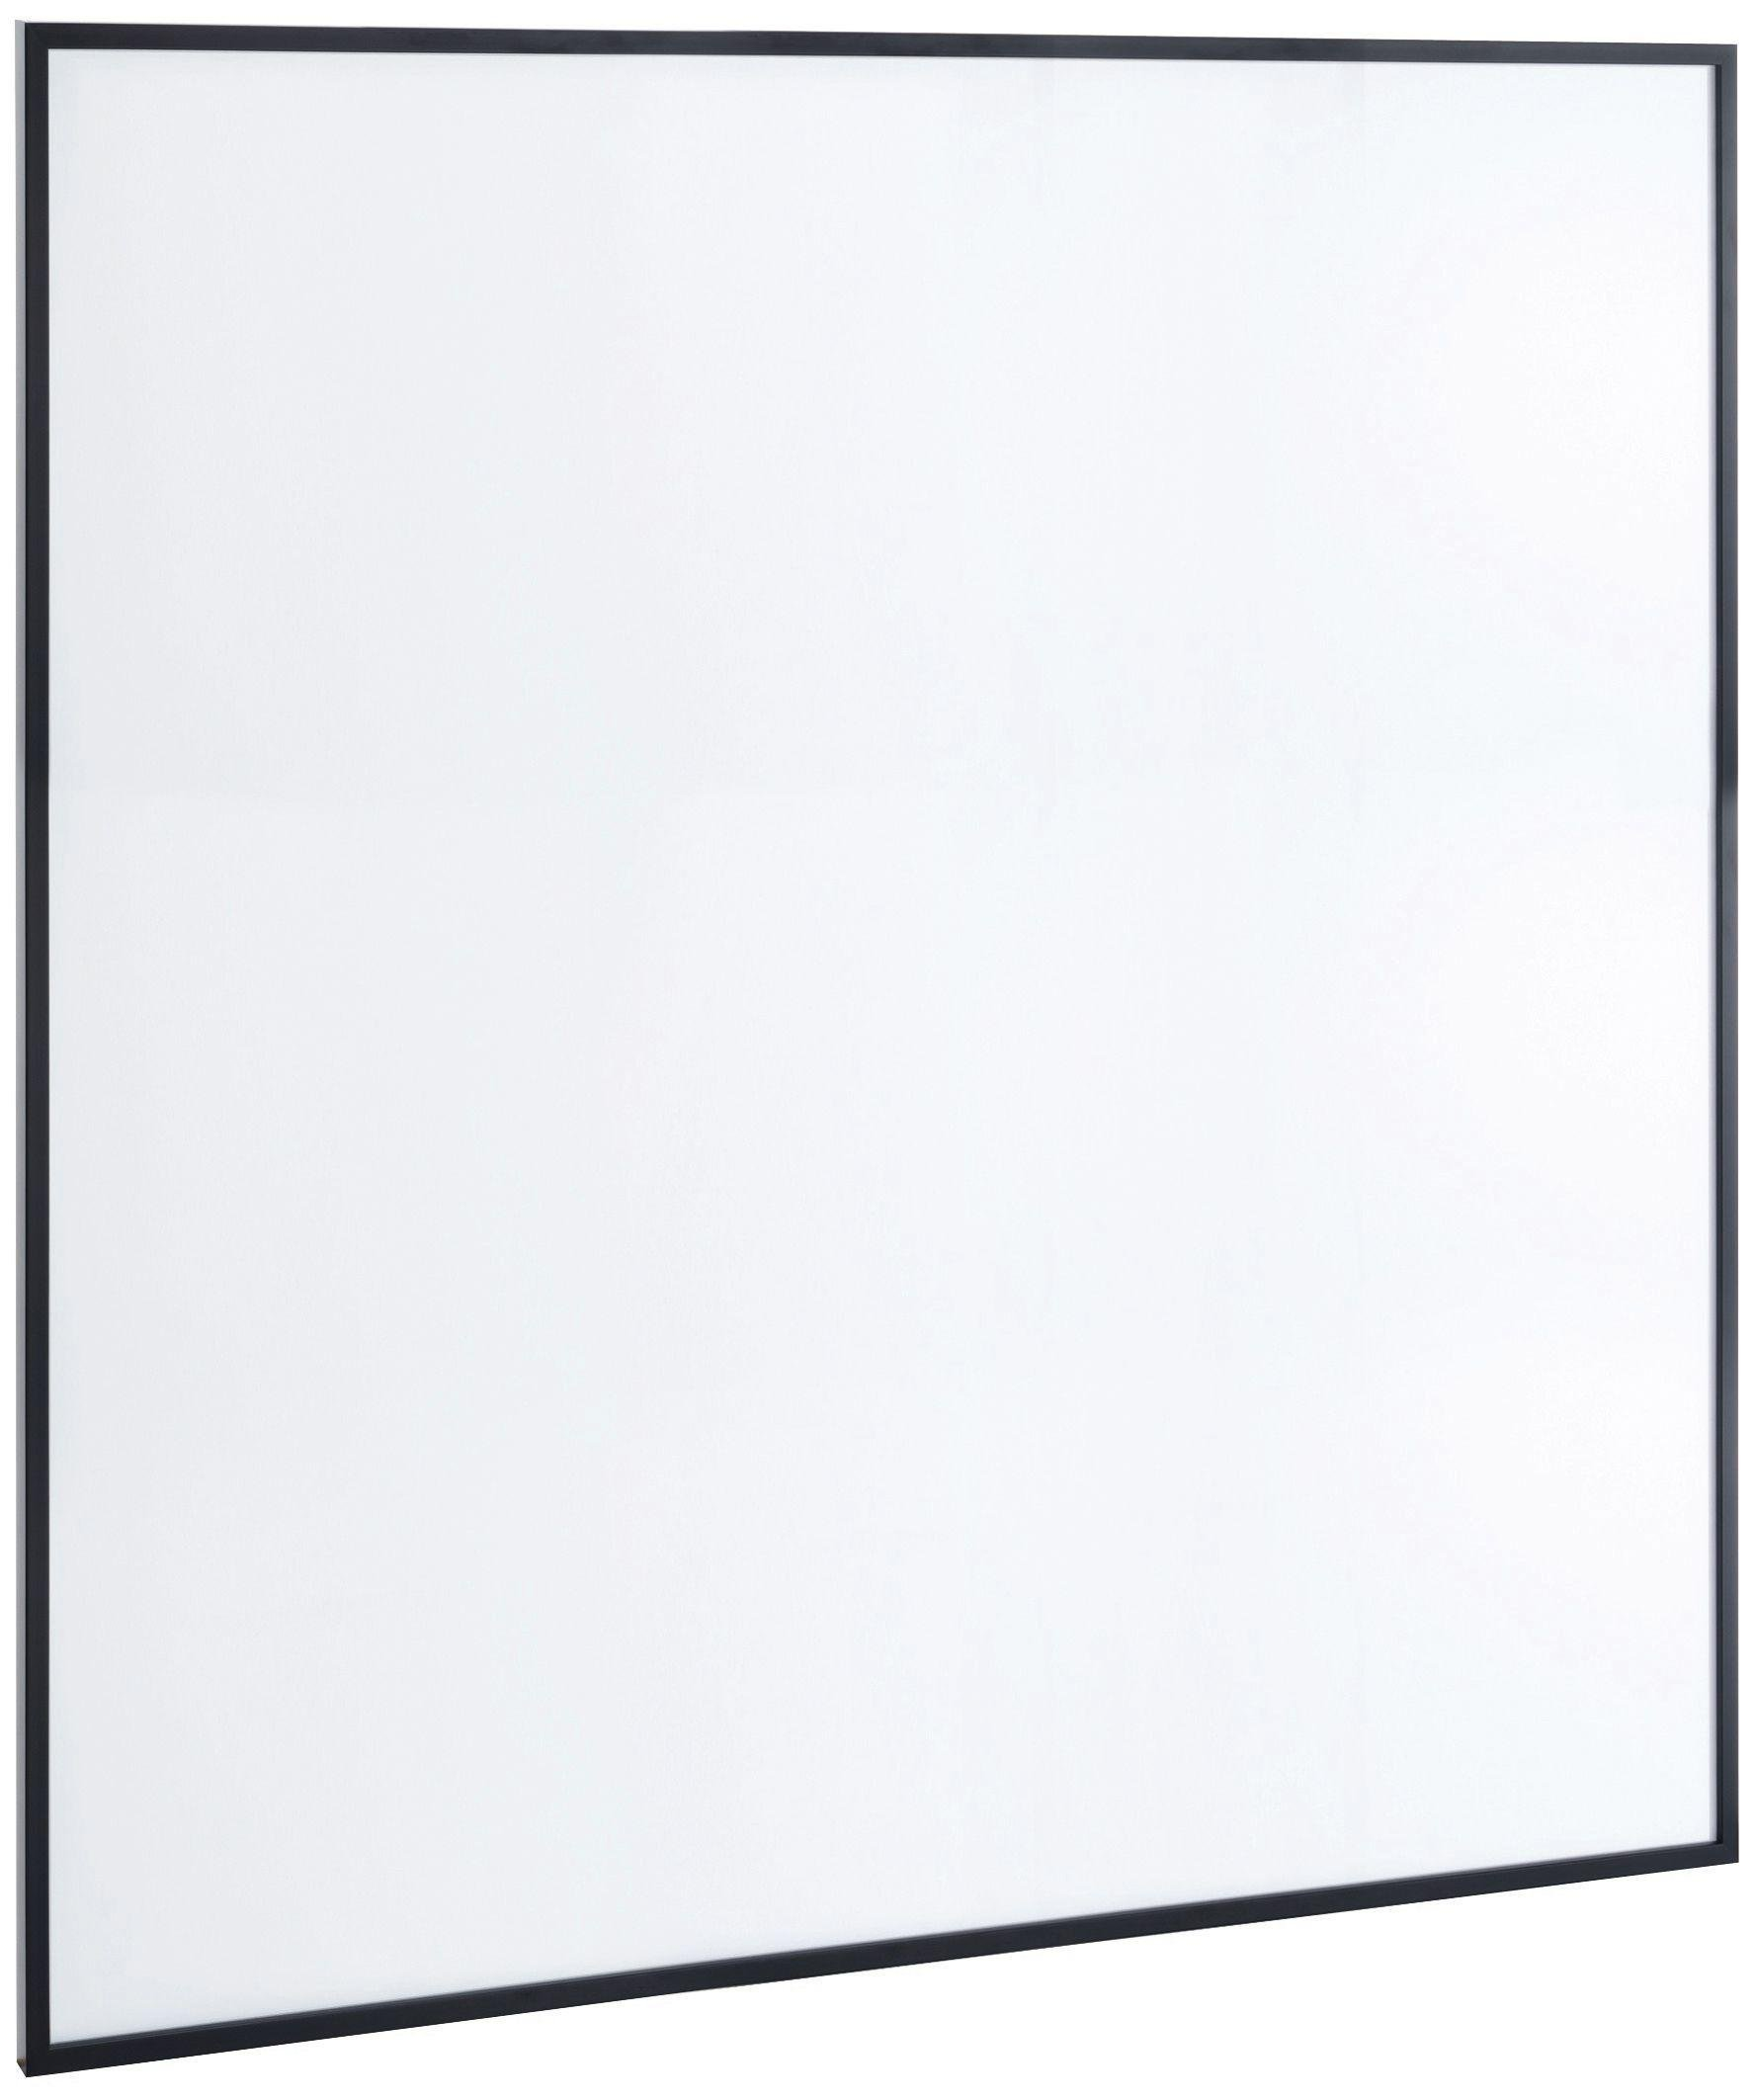 Image of Habitat 50x50cm Wall Frame - Dark Birch.